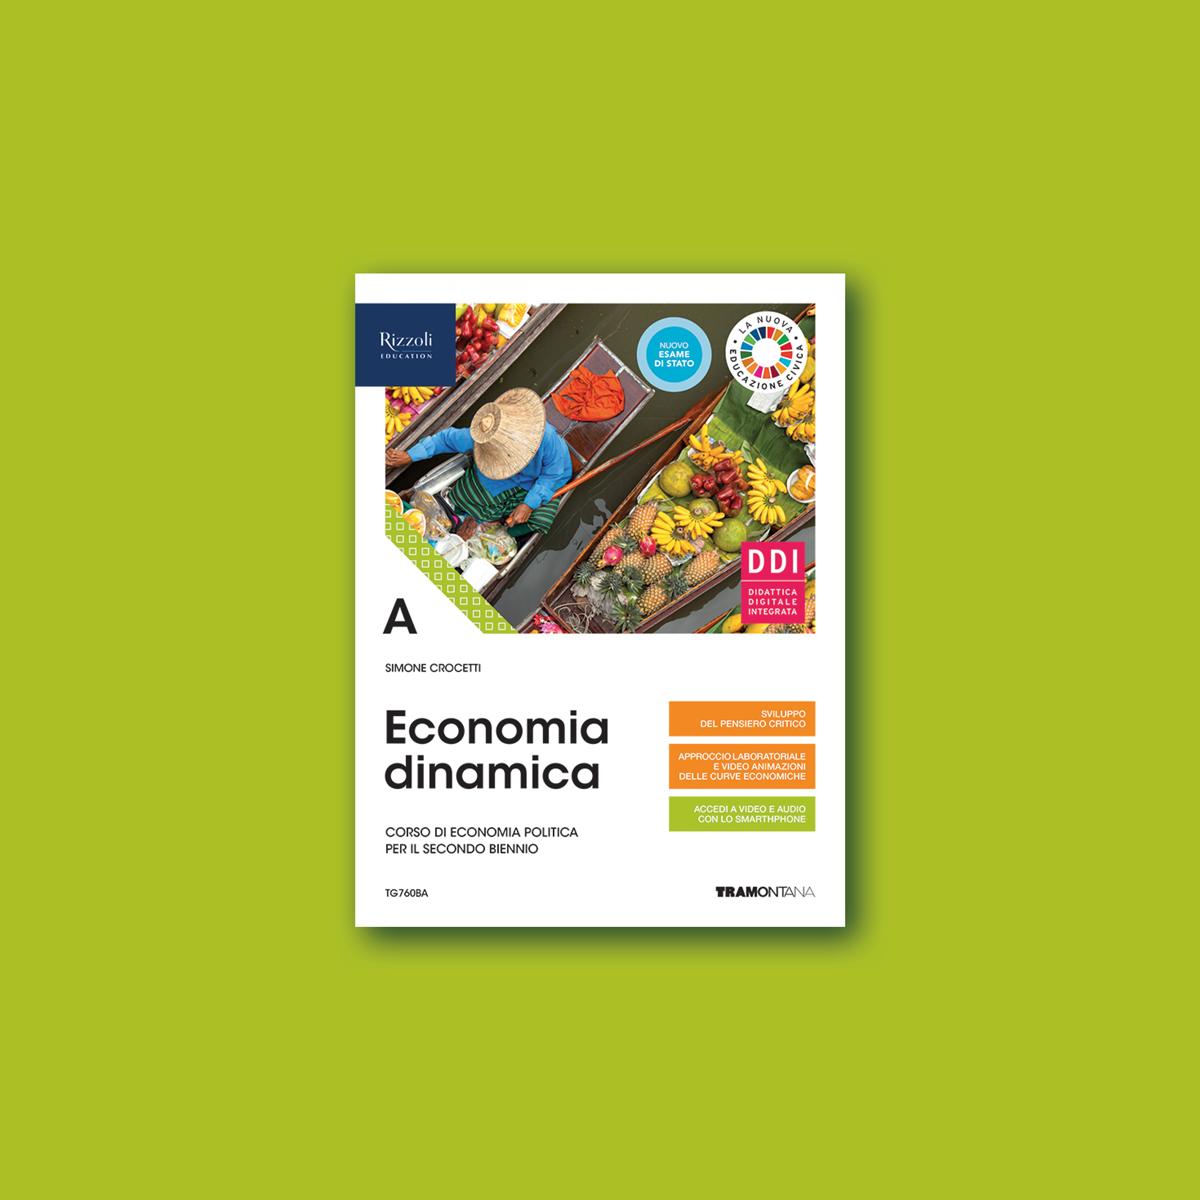 Economia dinamica